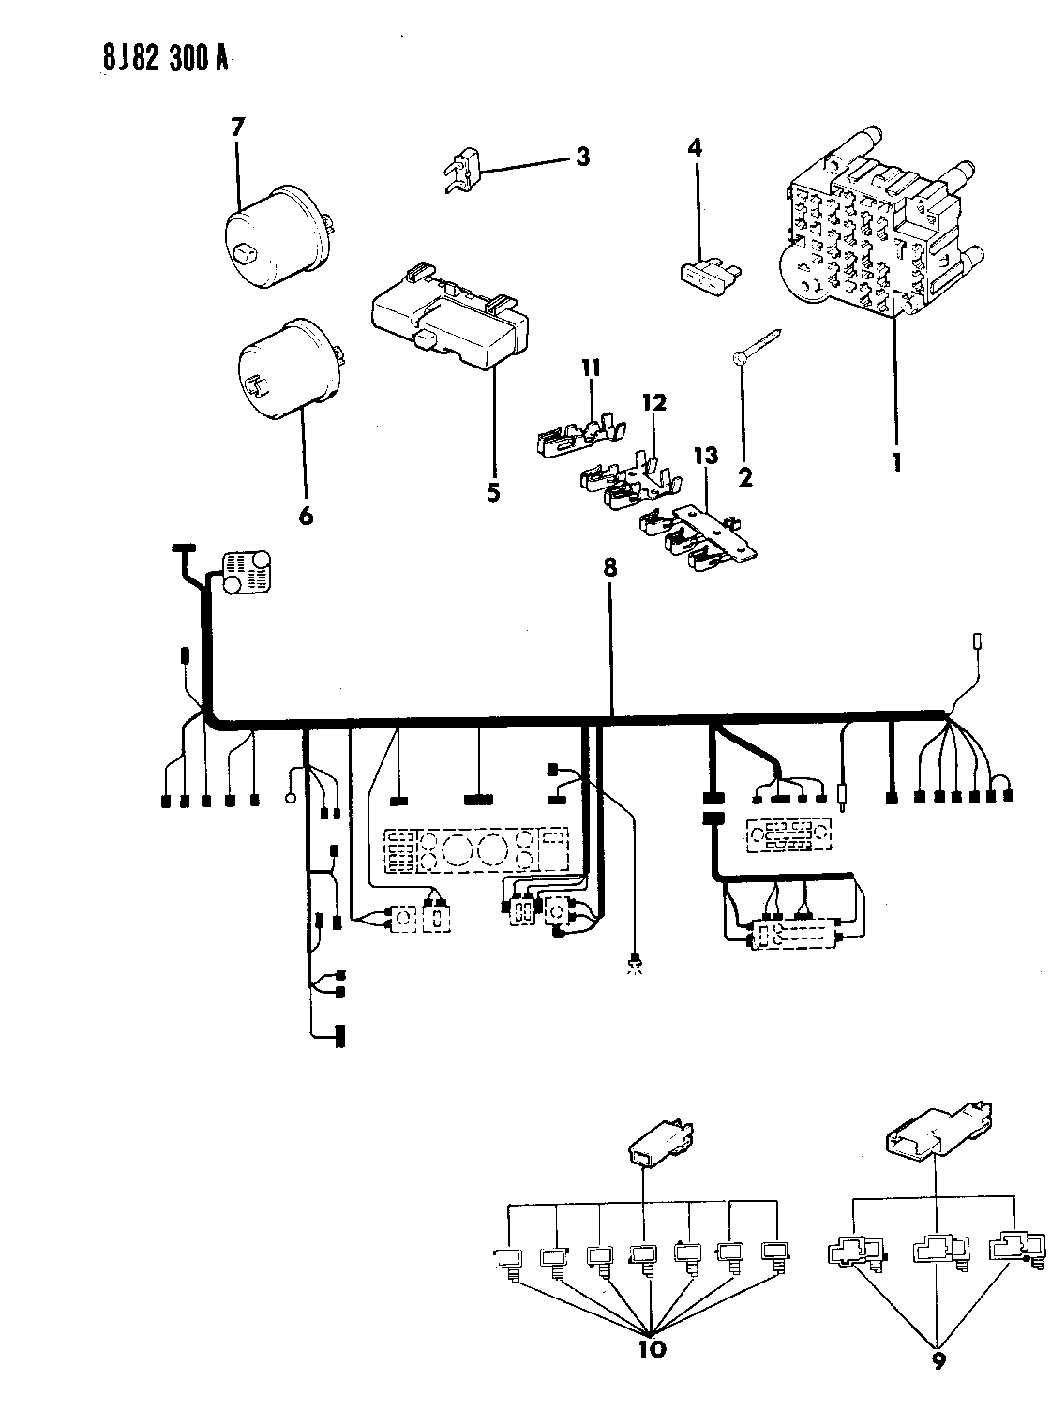 DD_7720] 1989 Jeep Cherokee Wiring Diagram 1989 Free Engine Image For User Schematic  WiringUmize Xero Atrix Arnes Elec Mohammedshrine Librar Wiring 101